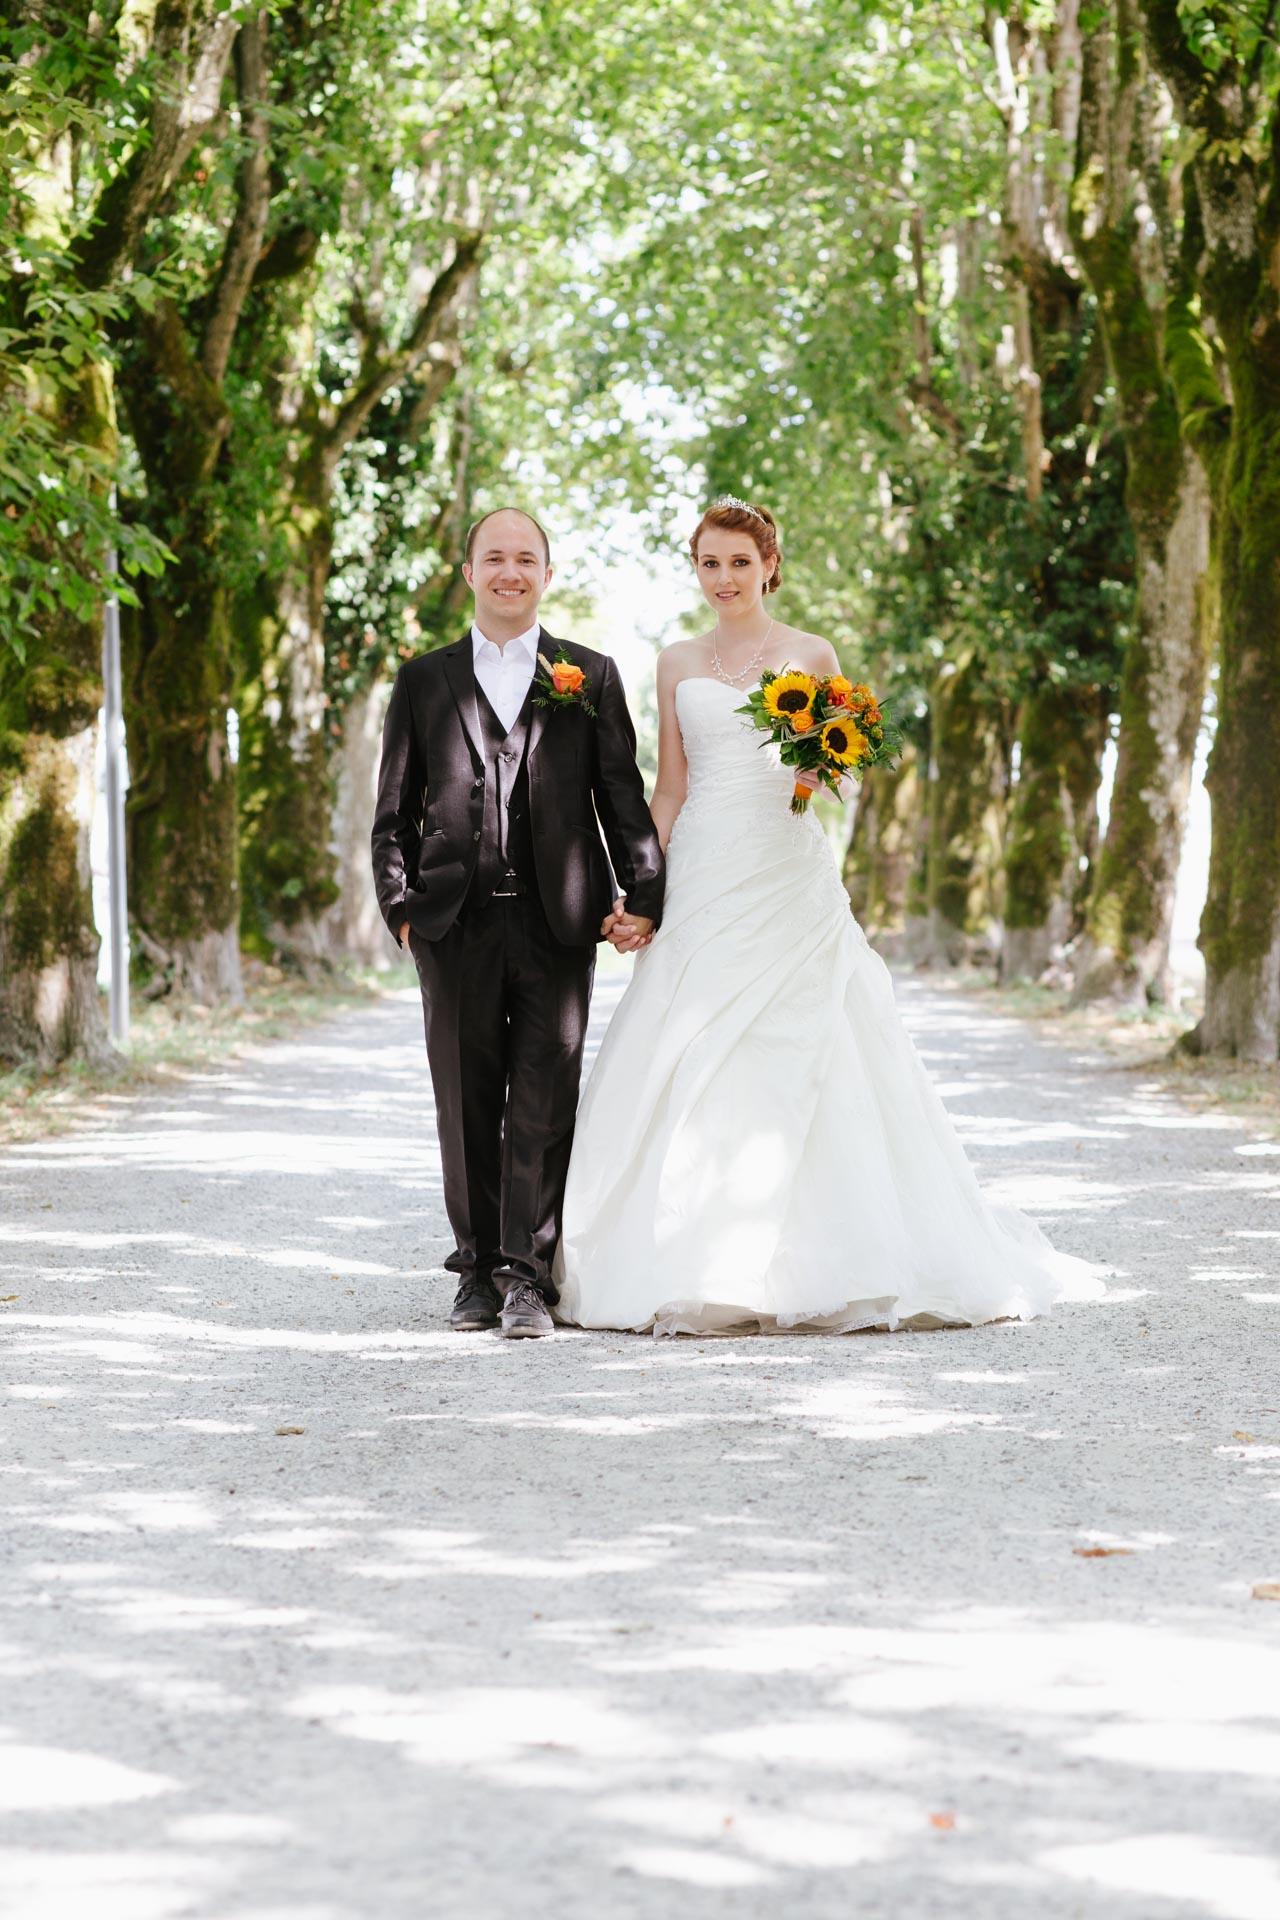 Pixelart_Hochzeitsfotografen_Loerrach_Rheinfelden_Hallwil_Schweiz_Linda-Ramon-1016